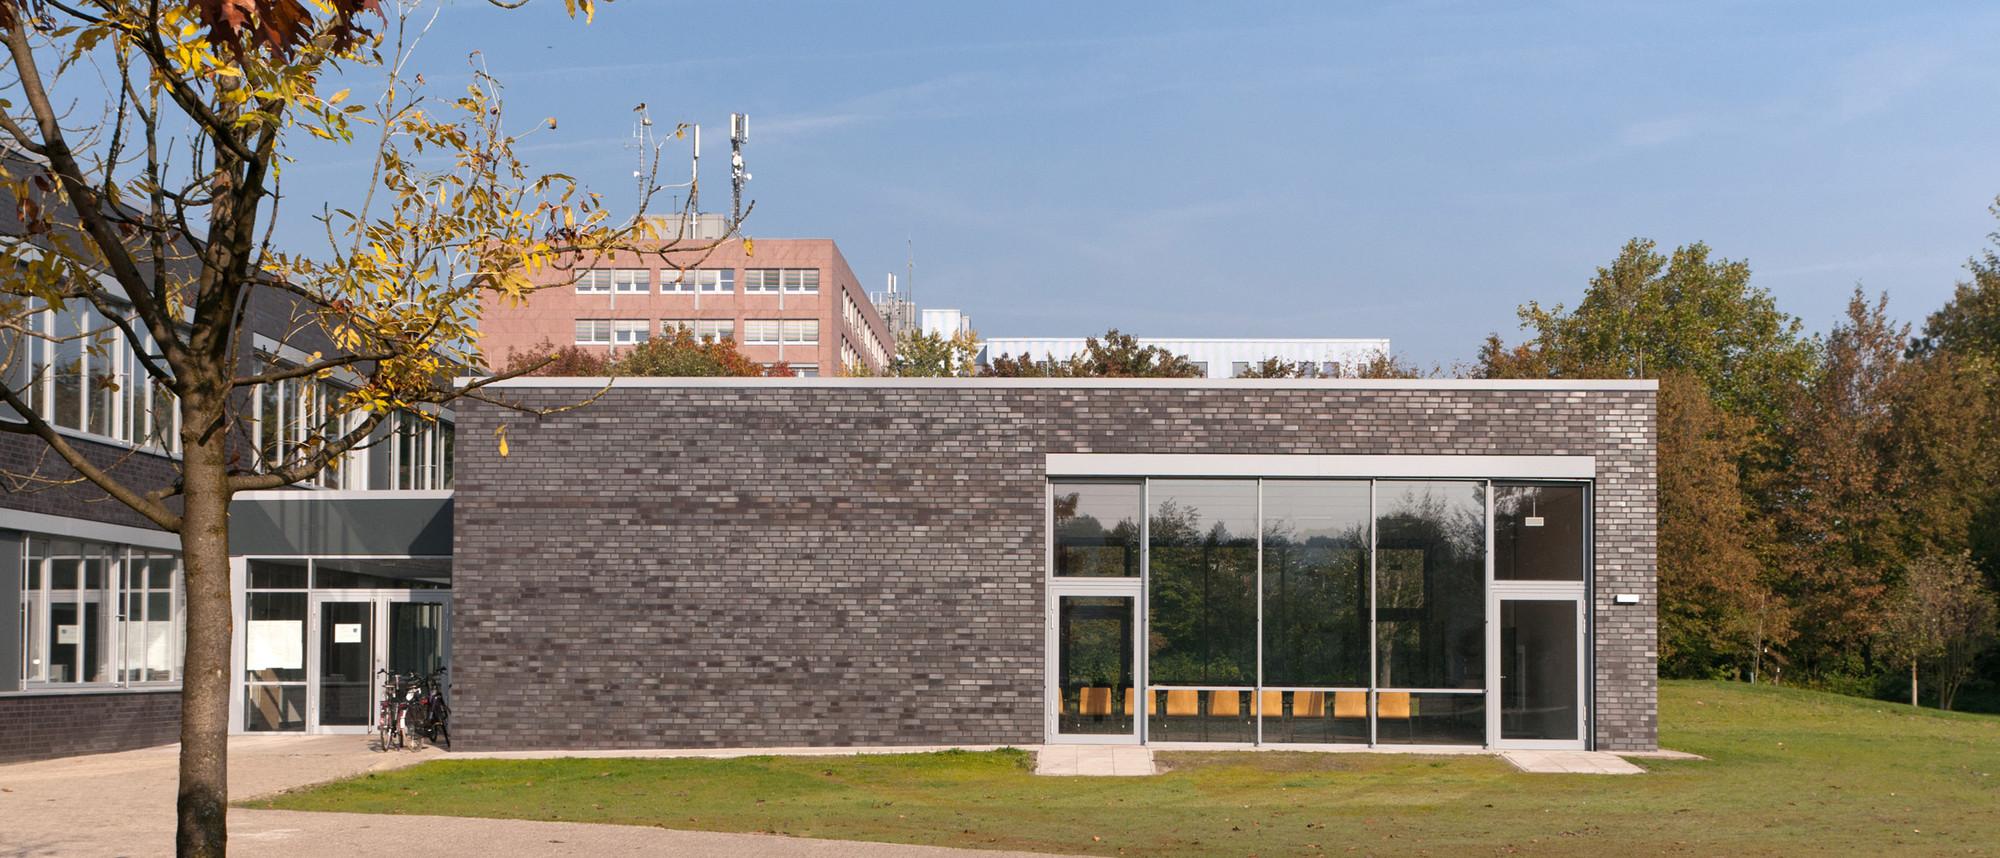 Technical Schools Steinfurt / agn Niederberghaus & Partner GmbH, © Jörg Albano-Müller